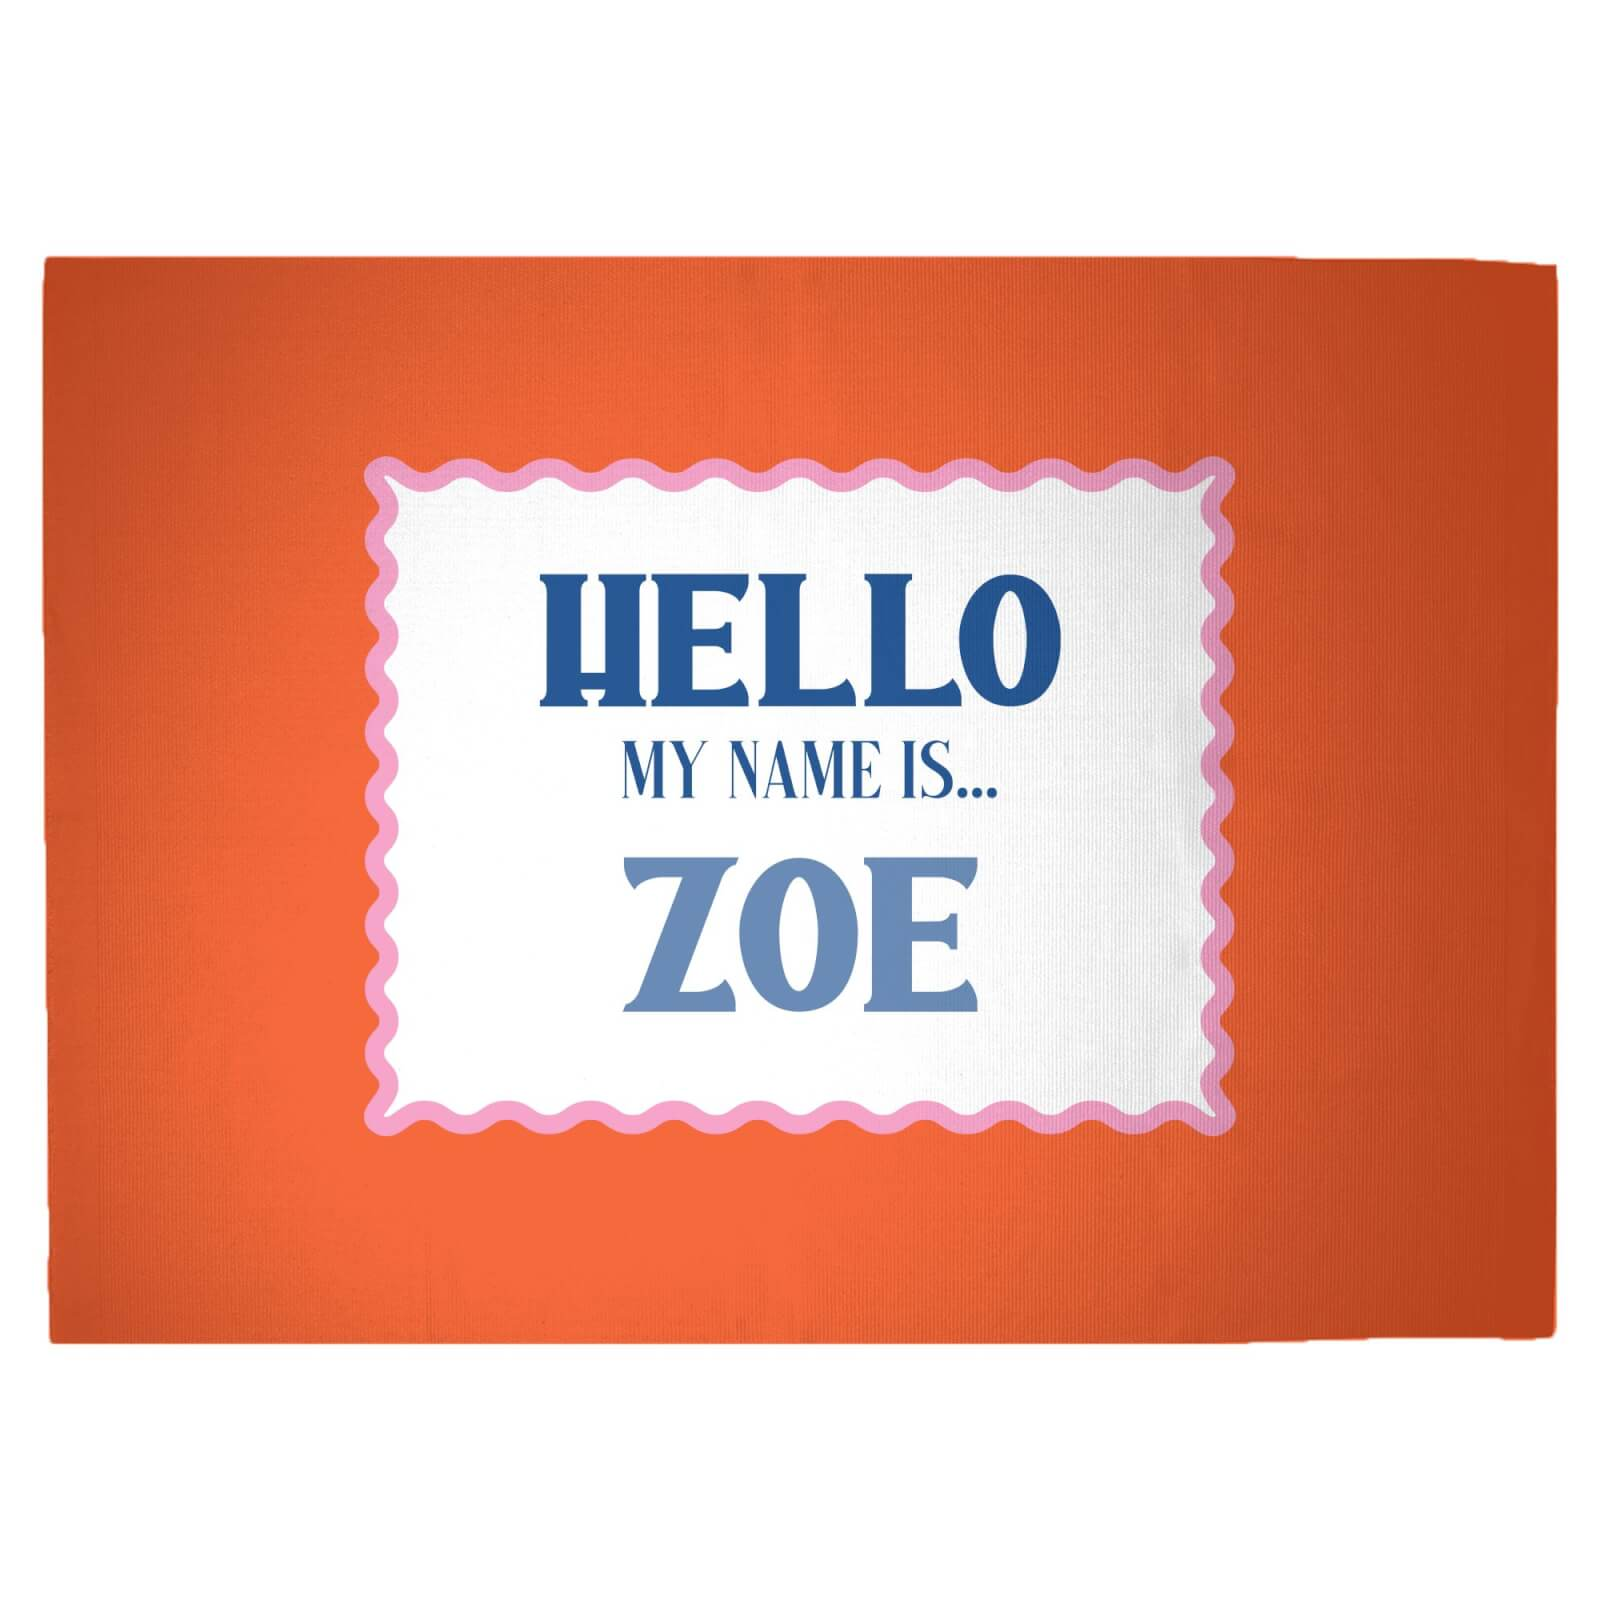 Hello, My Name Is Zoe Woven Rug - Large